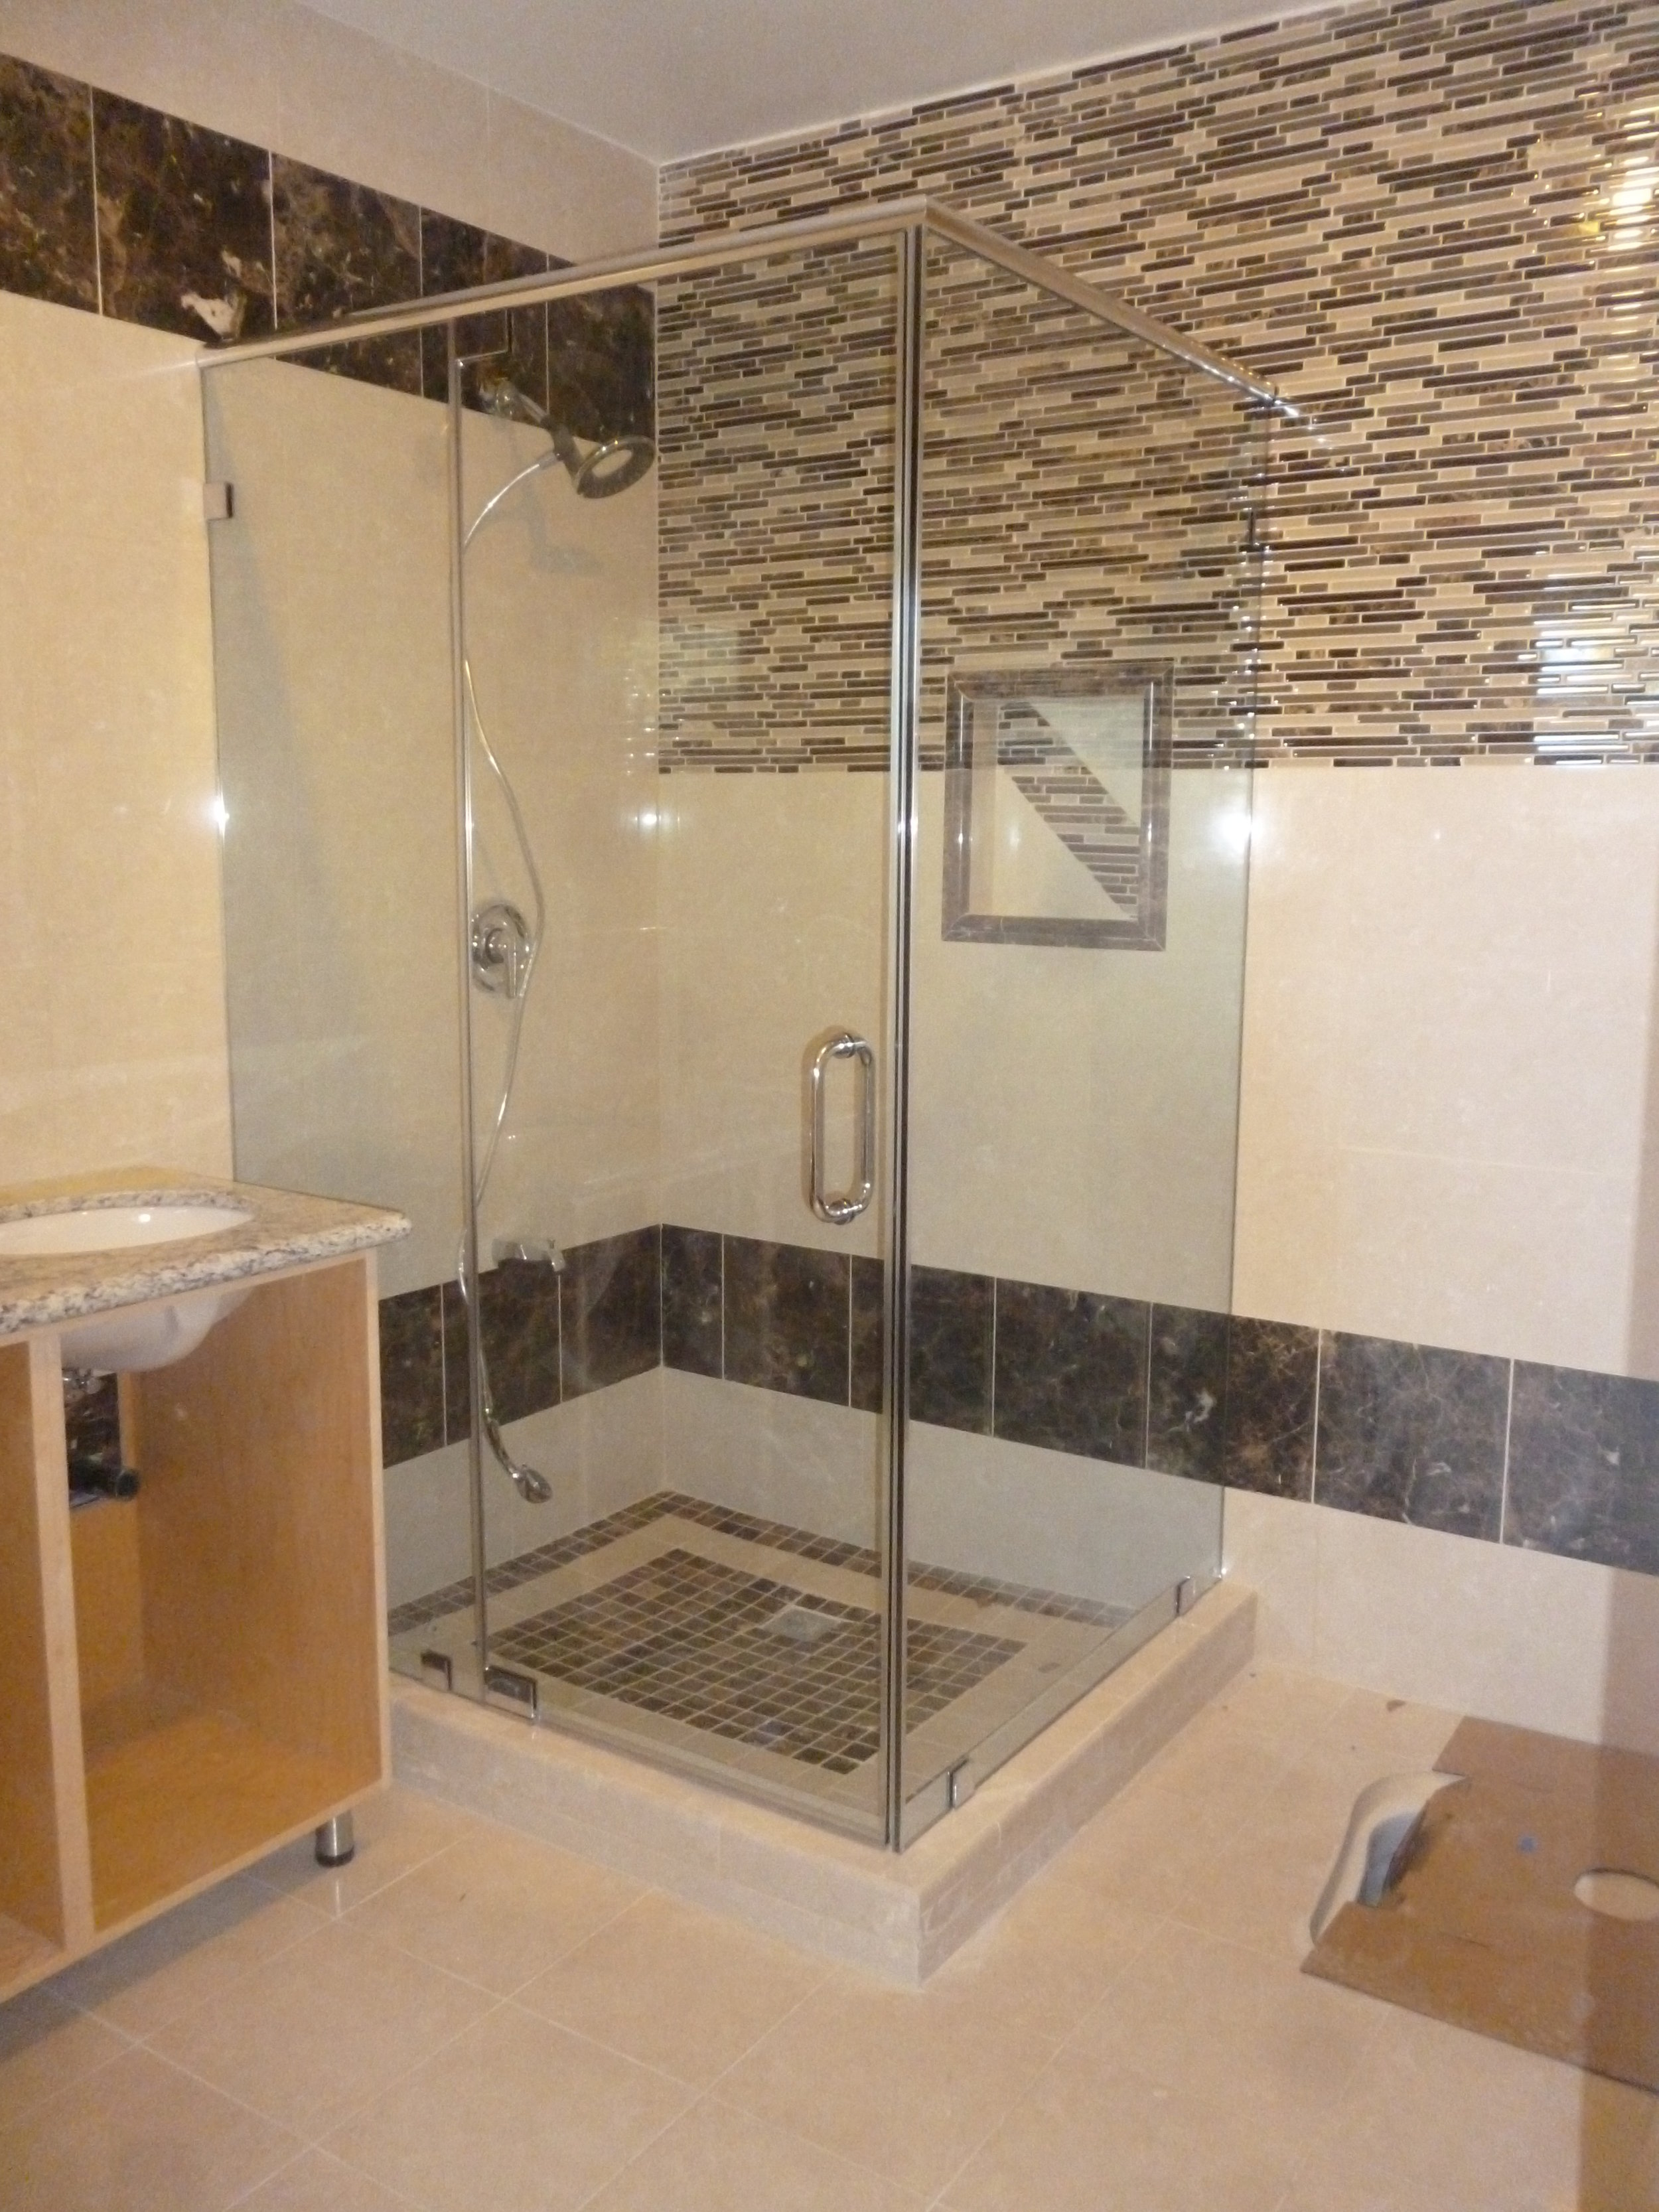 Shower-Doors-Residential-Photos-11.jpg